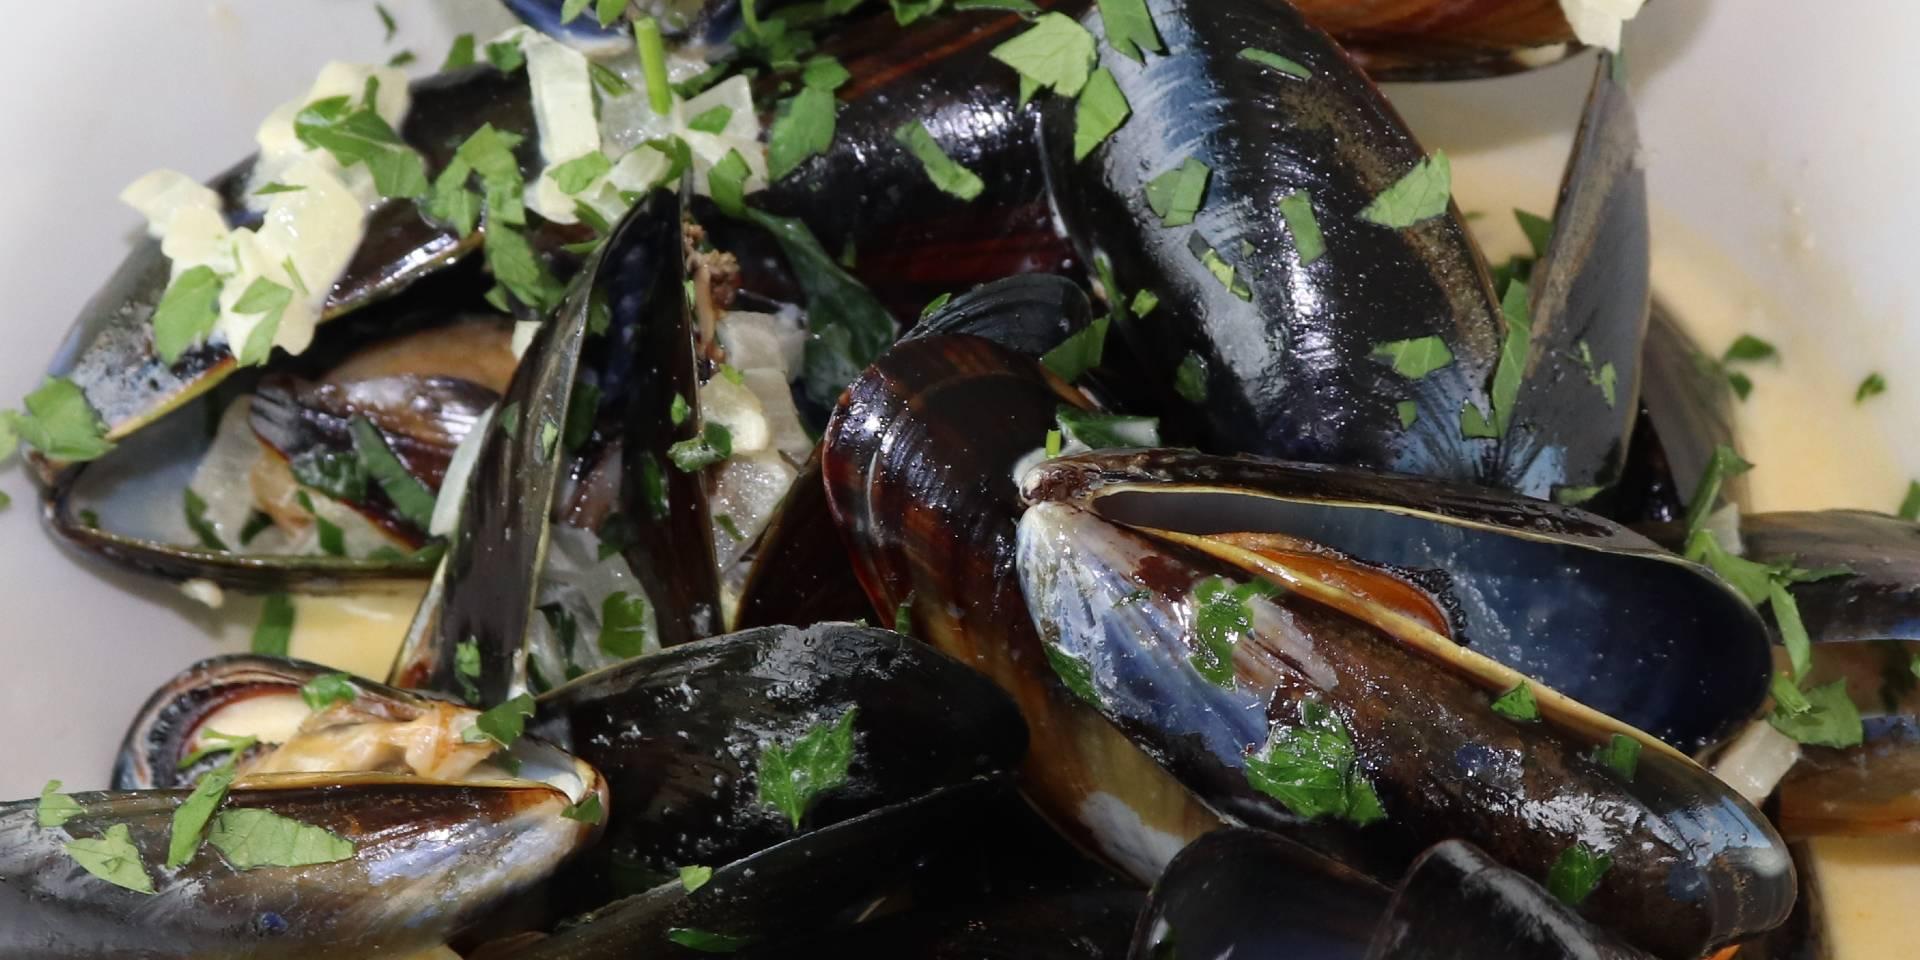 Connemara-Mussels